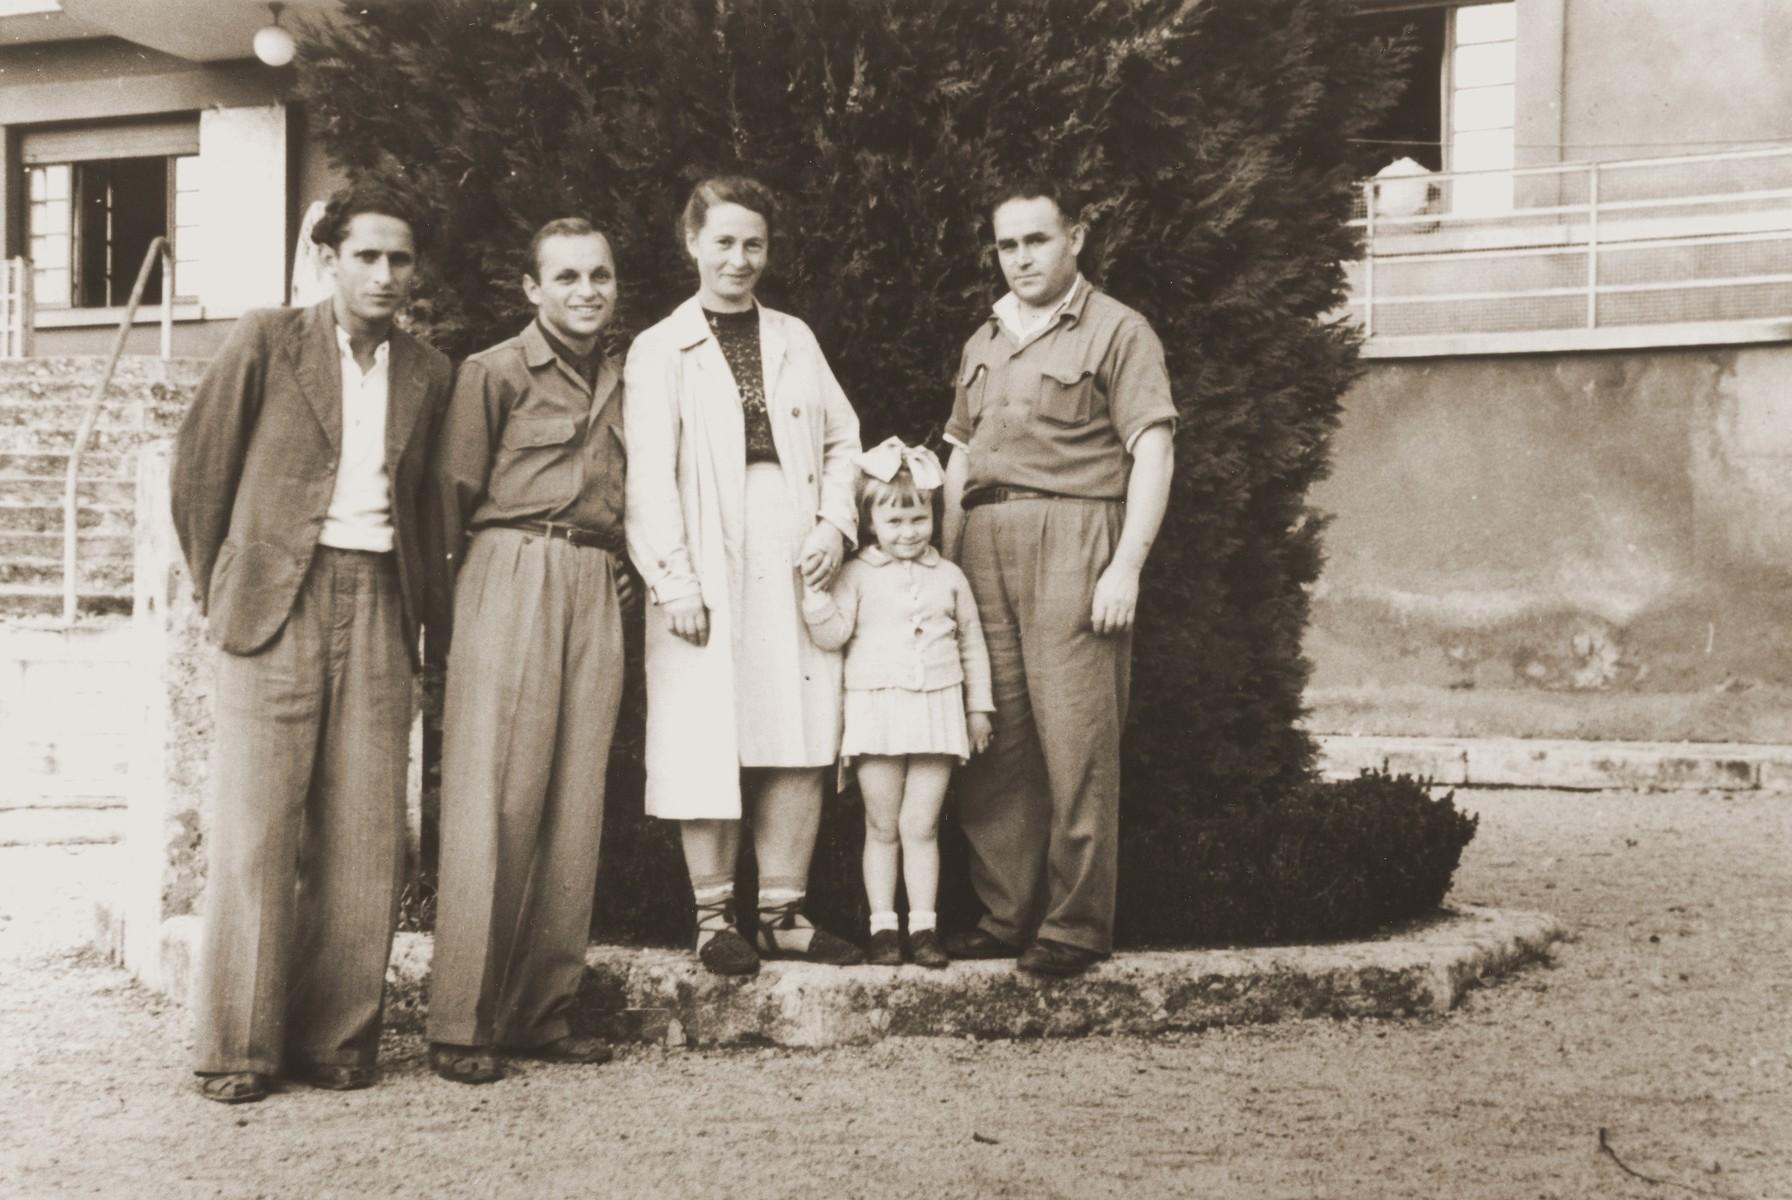 Group portrait of Jewish DPs at the children's home in Selvino, Italy.  Standing left to right are: Moishe Schwartzblatt, unknown, Zelda Leikach, Masha and Motel Leikach.